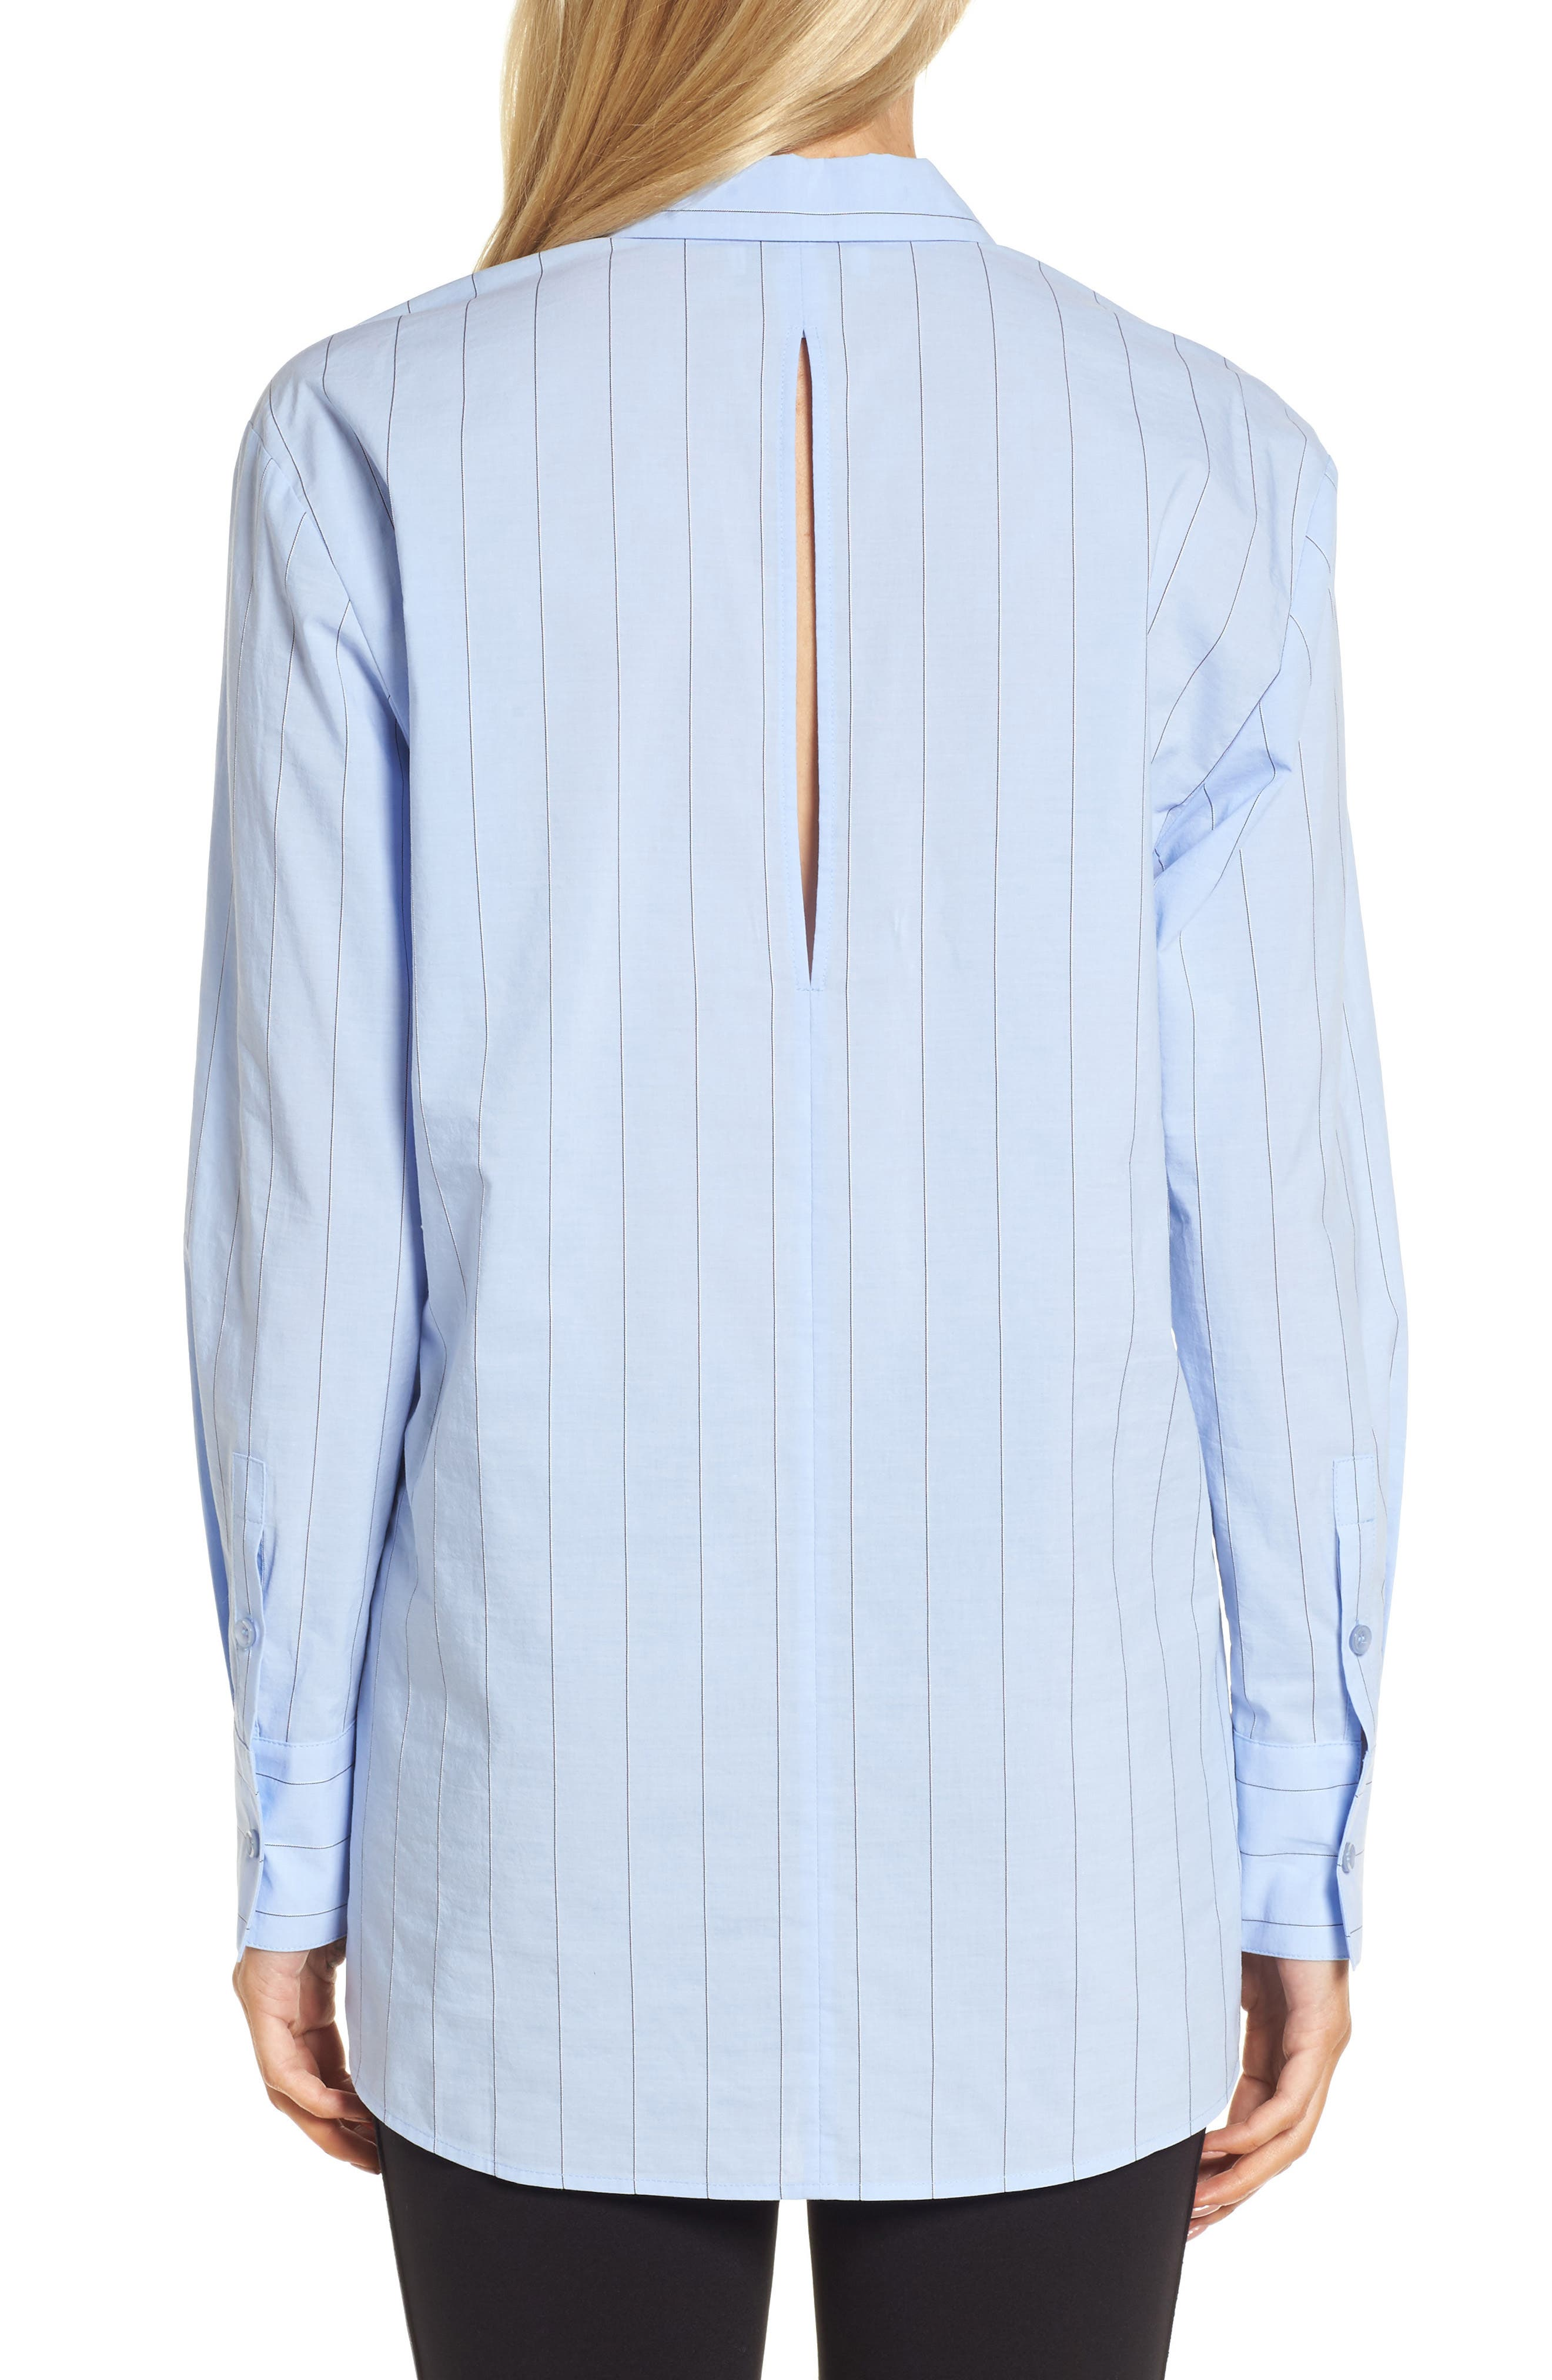 Keyhole Back Stripe Tunic Shirt,                             Alternate thumbnail 2, color,                             Blue Oxford Micro Stripe